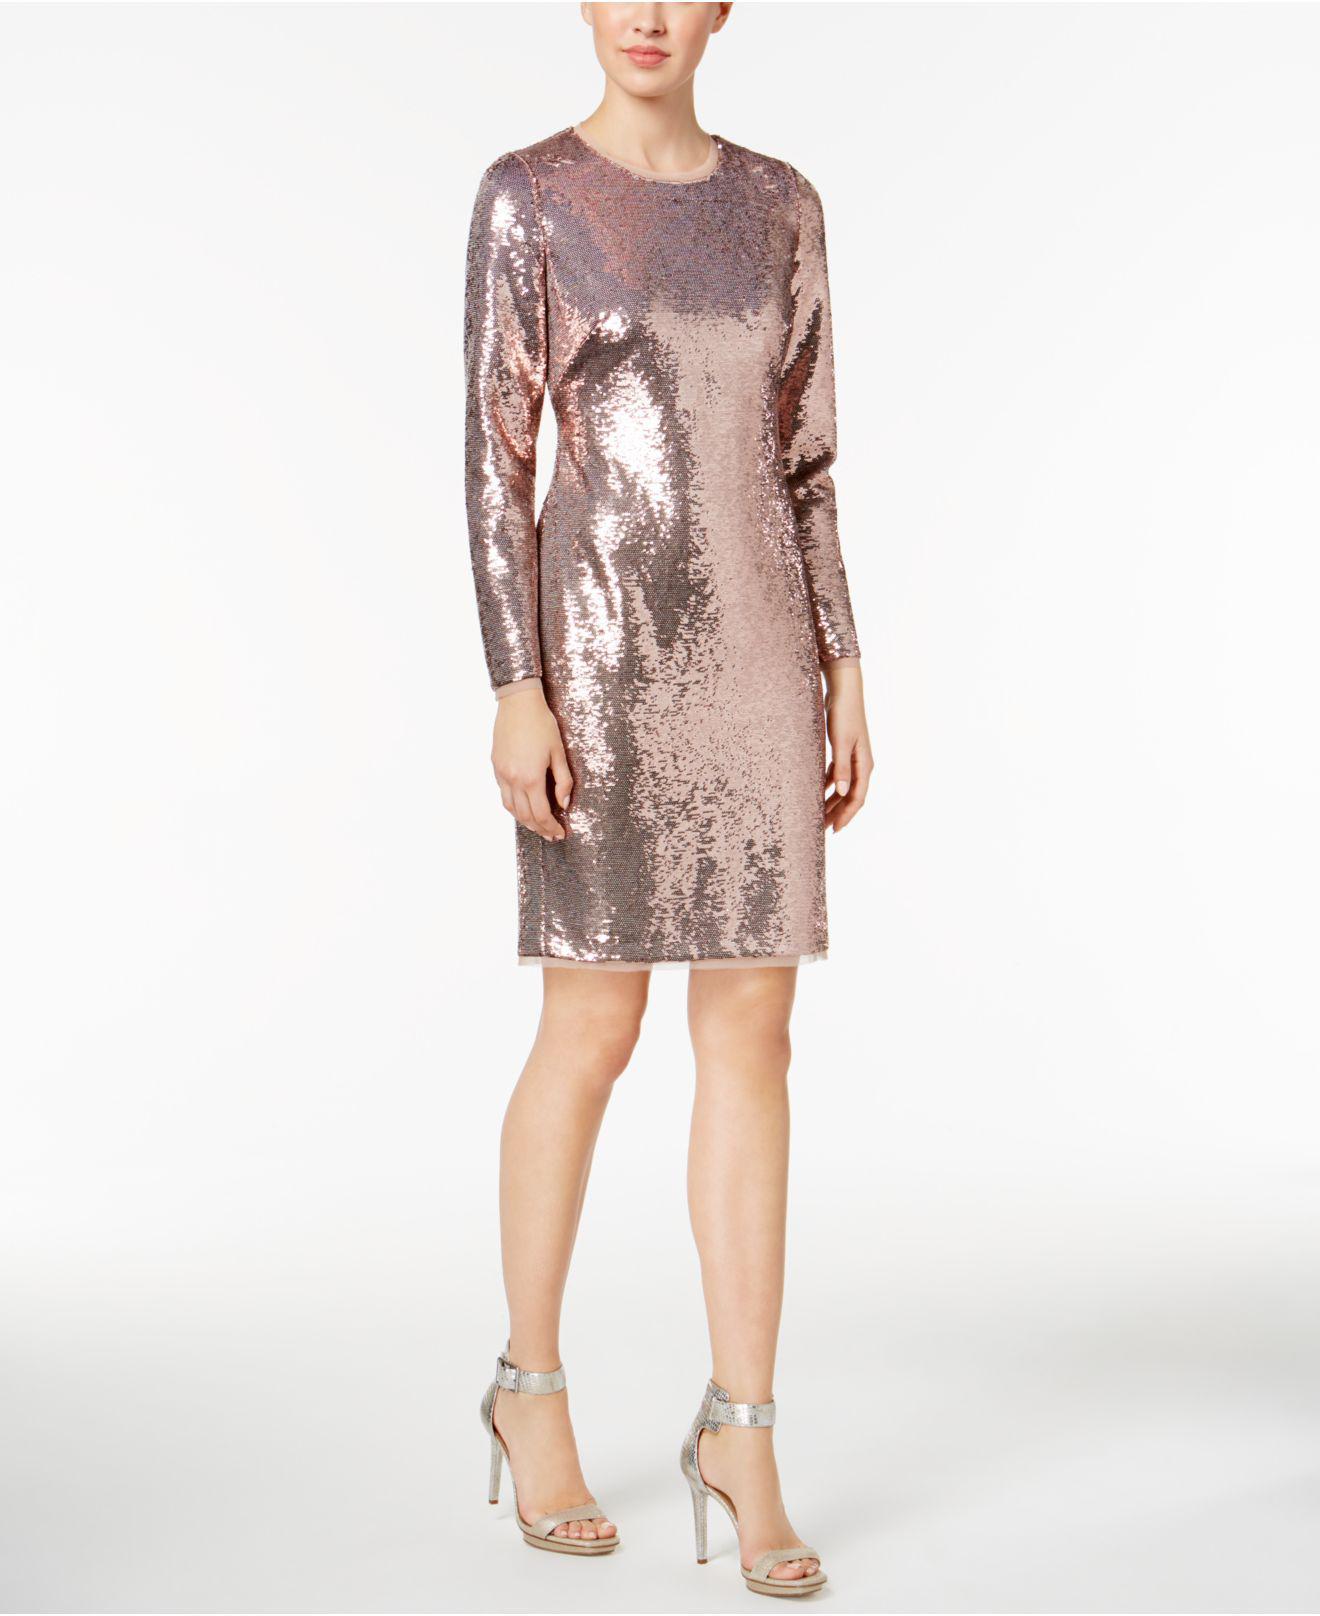 Long Sleeve Sequined Sheath Dress